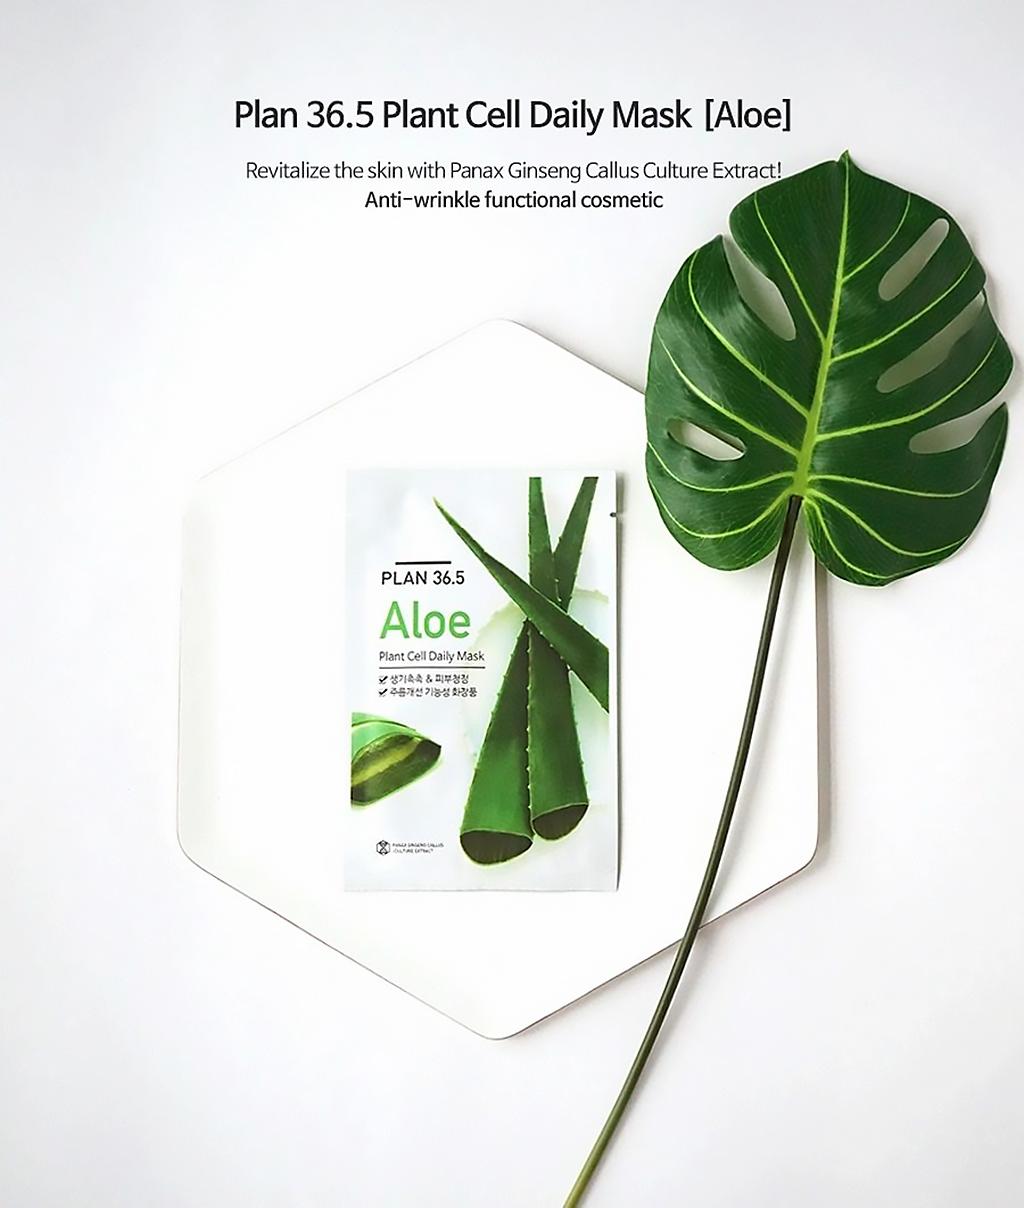 plan365-dailymask-aloevera-description-1.jpeg